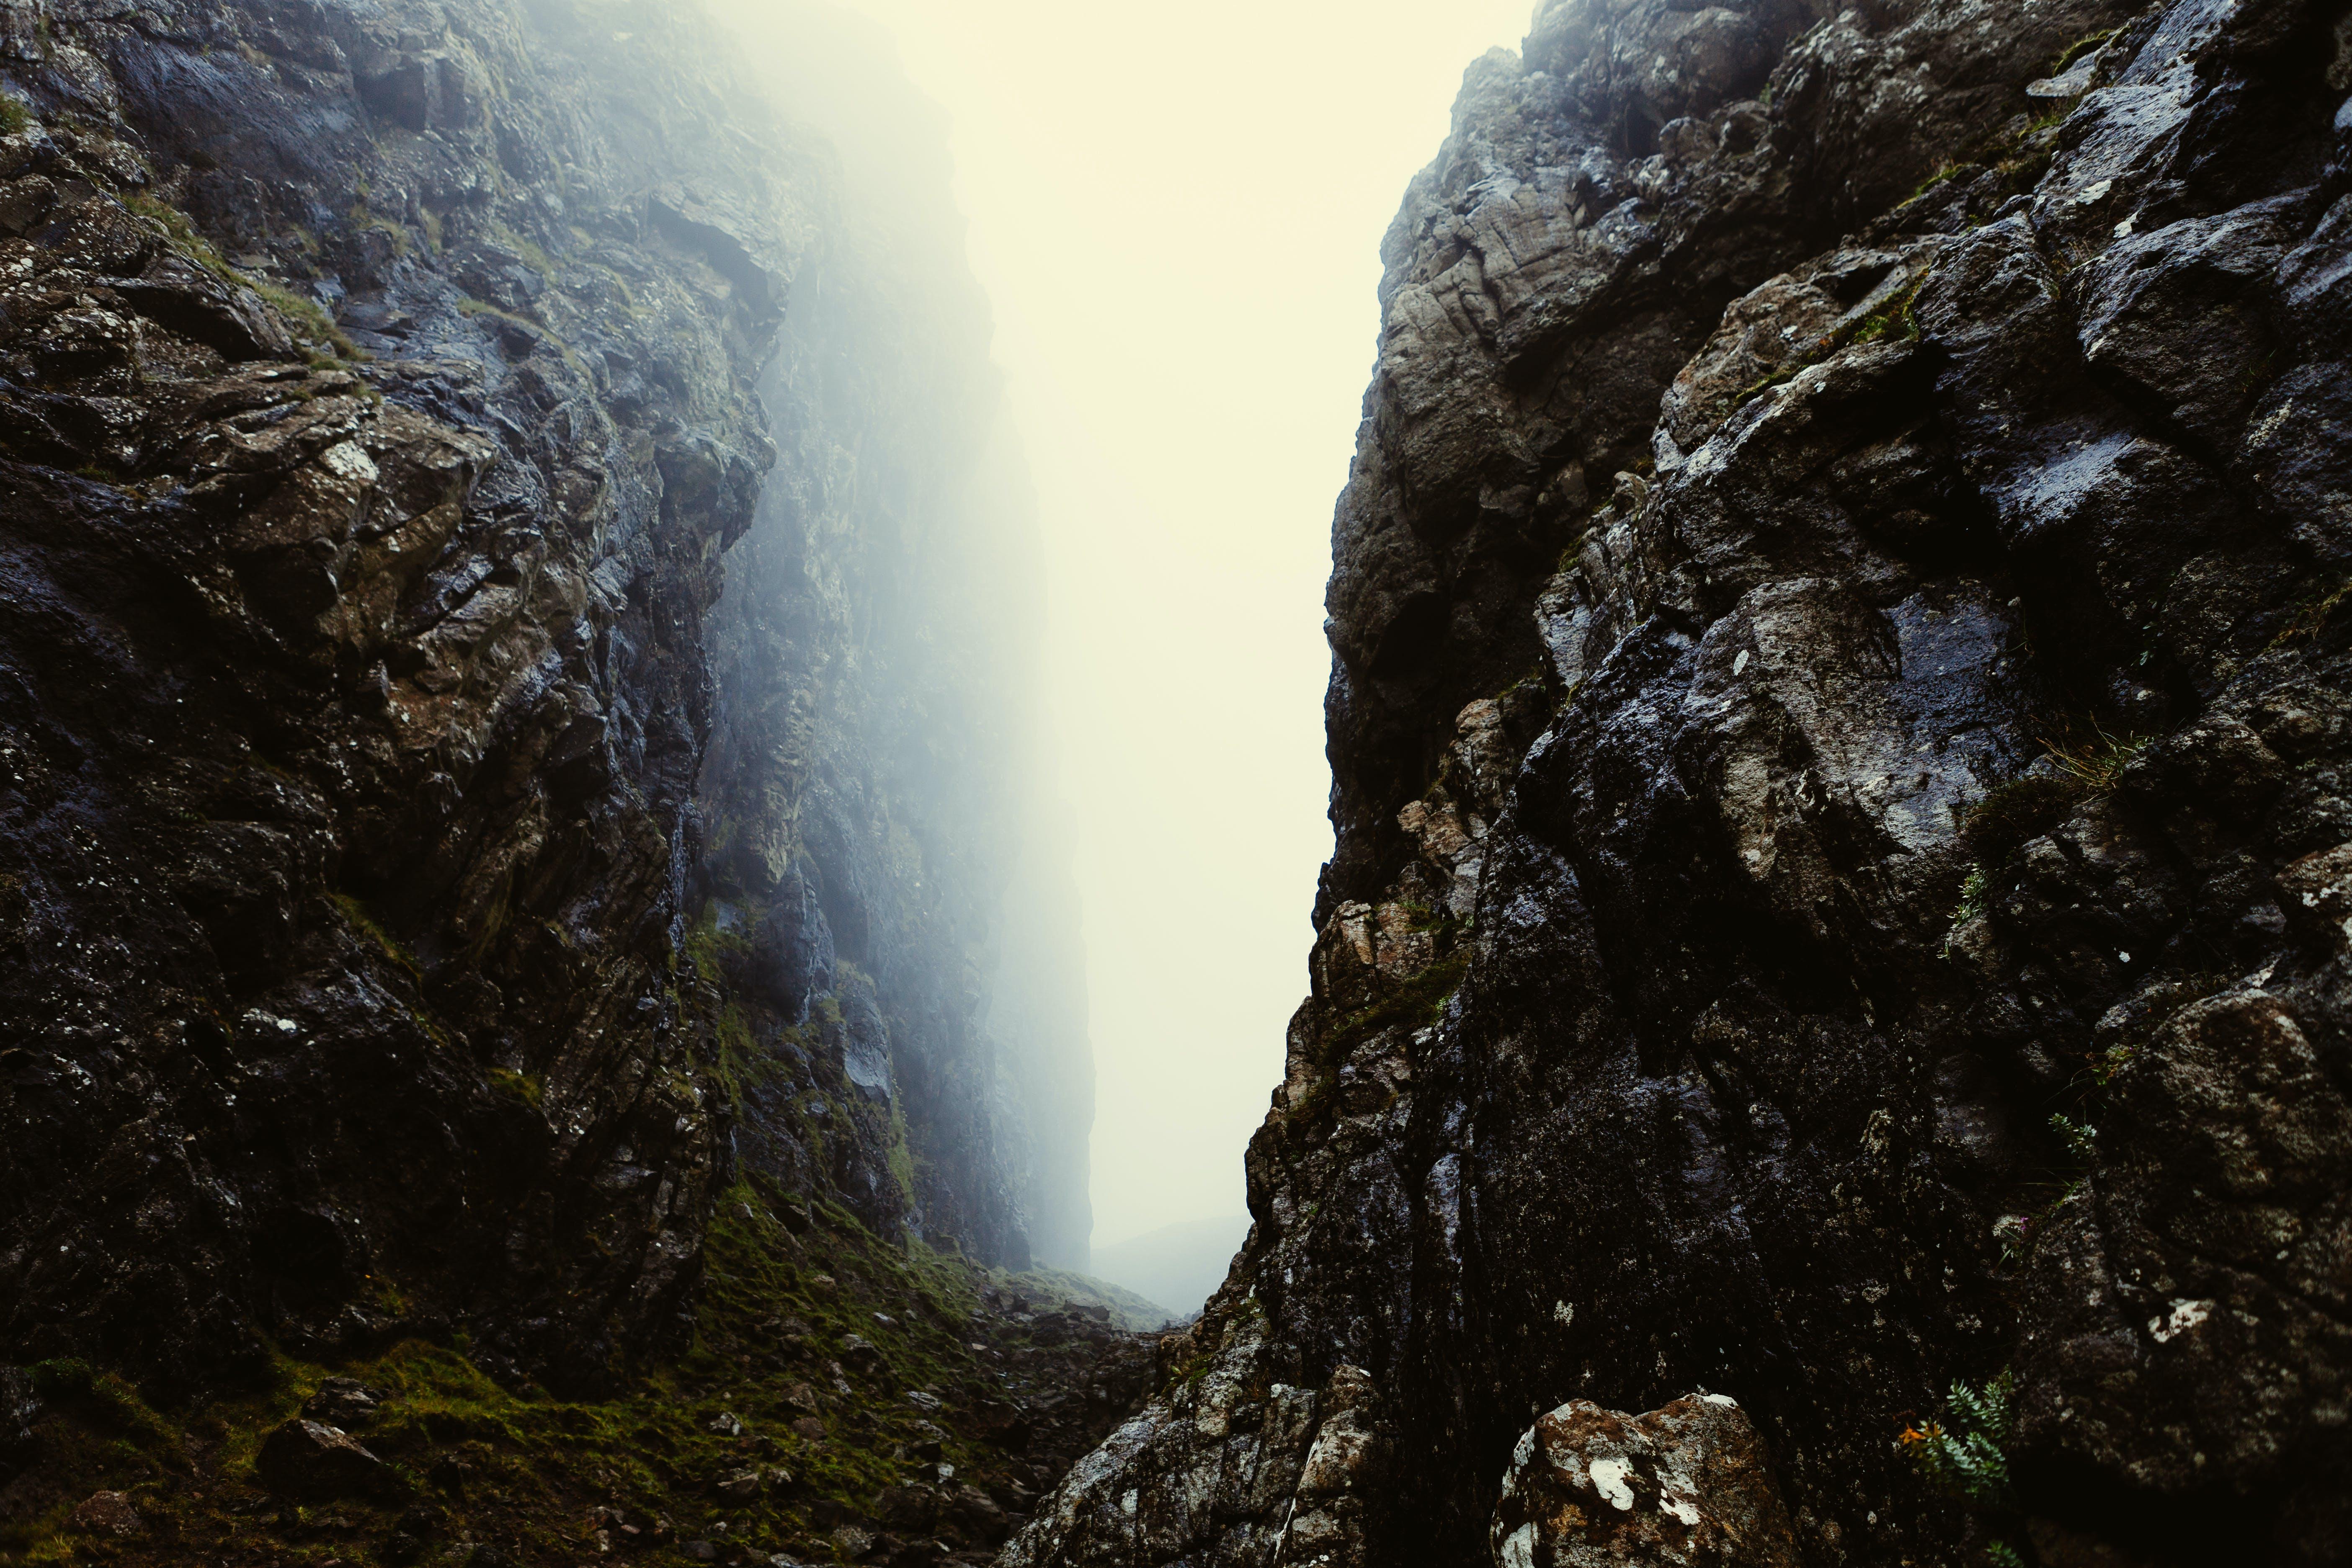 Gratis lagerfoto af klippe, Skotland, sten, sti